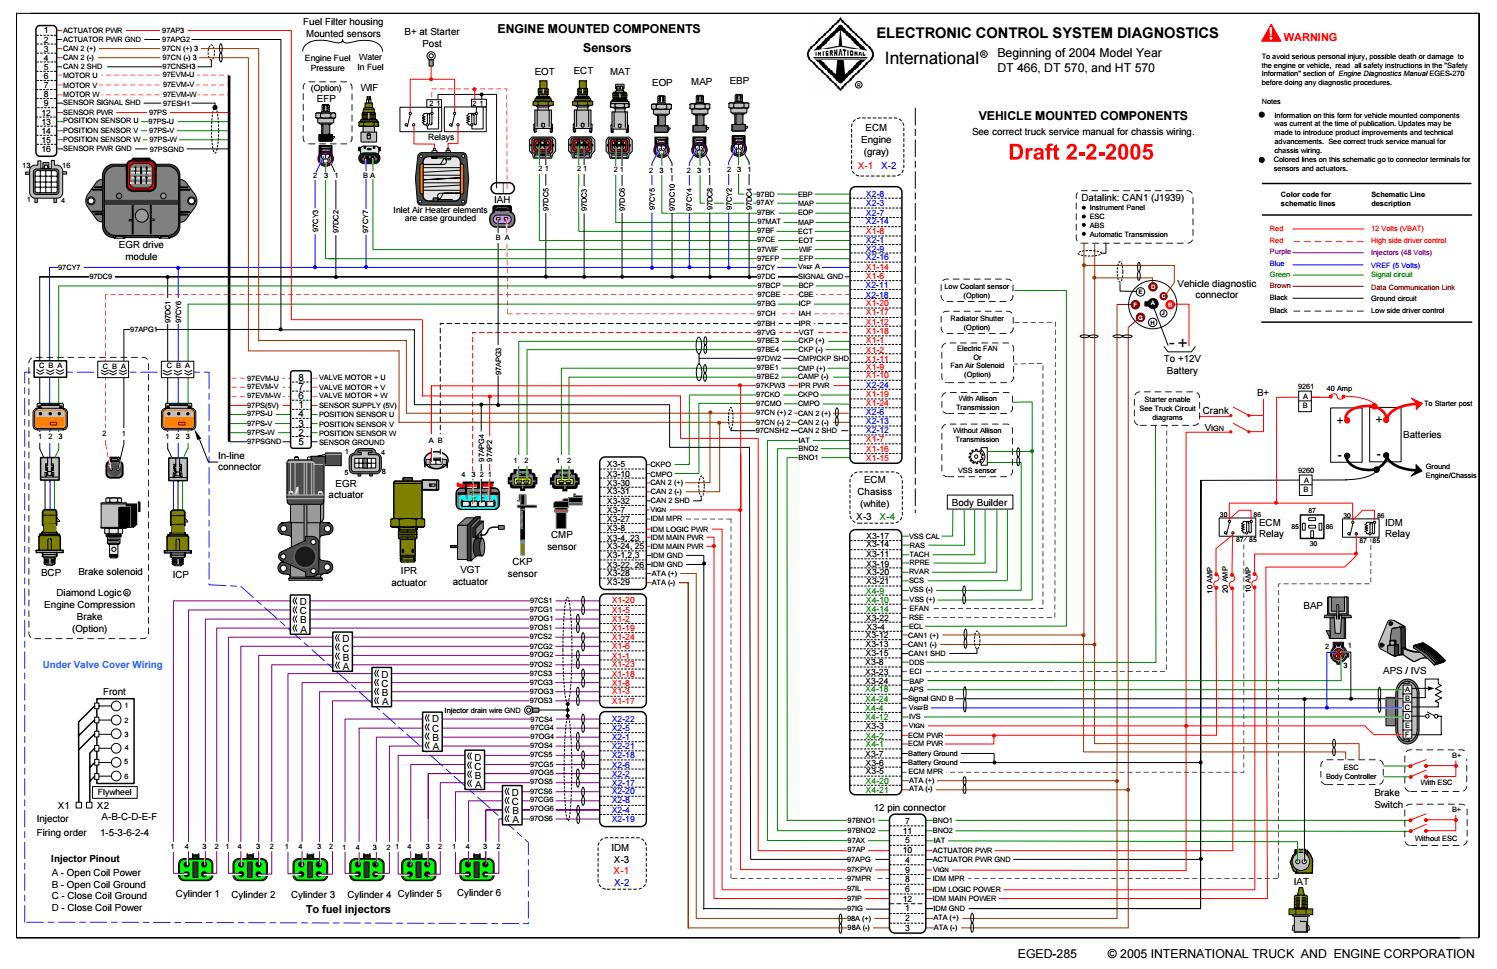 International Dt466-dt570-ht570 Engine Electrical Diagram by heydownloads -  issuuIssuu